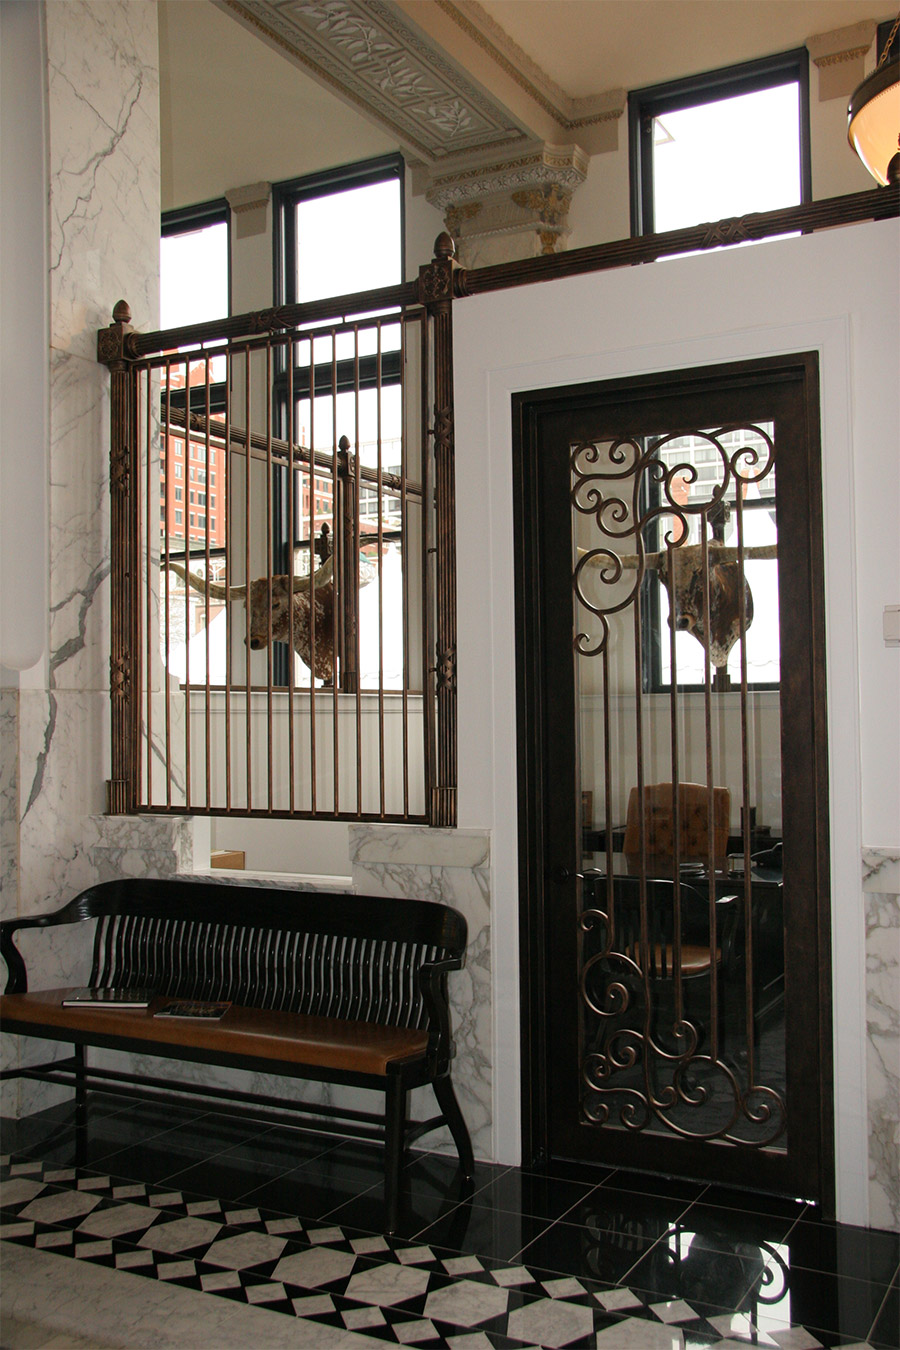 Worthington-CLA-S2-073-Classic-Steel-Doors-(34)-como-objeto-inteligente-1